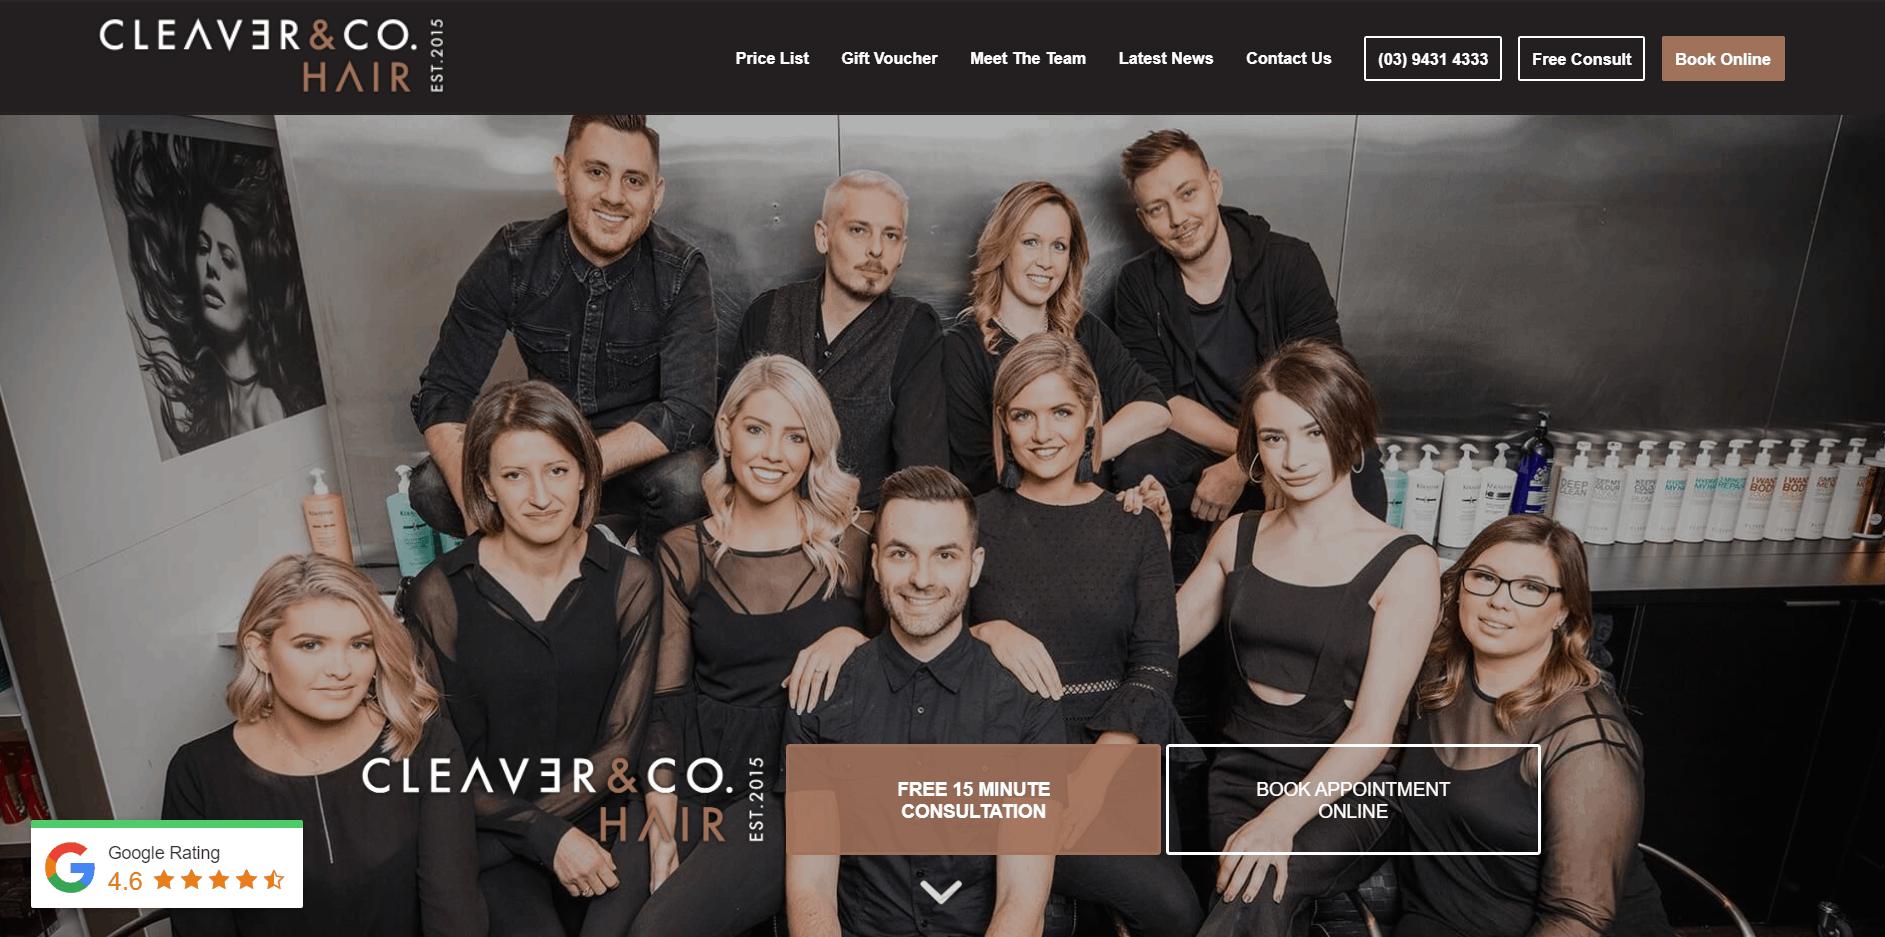 Cleaver & Co. Hair